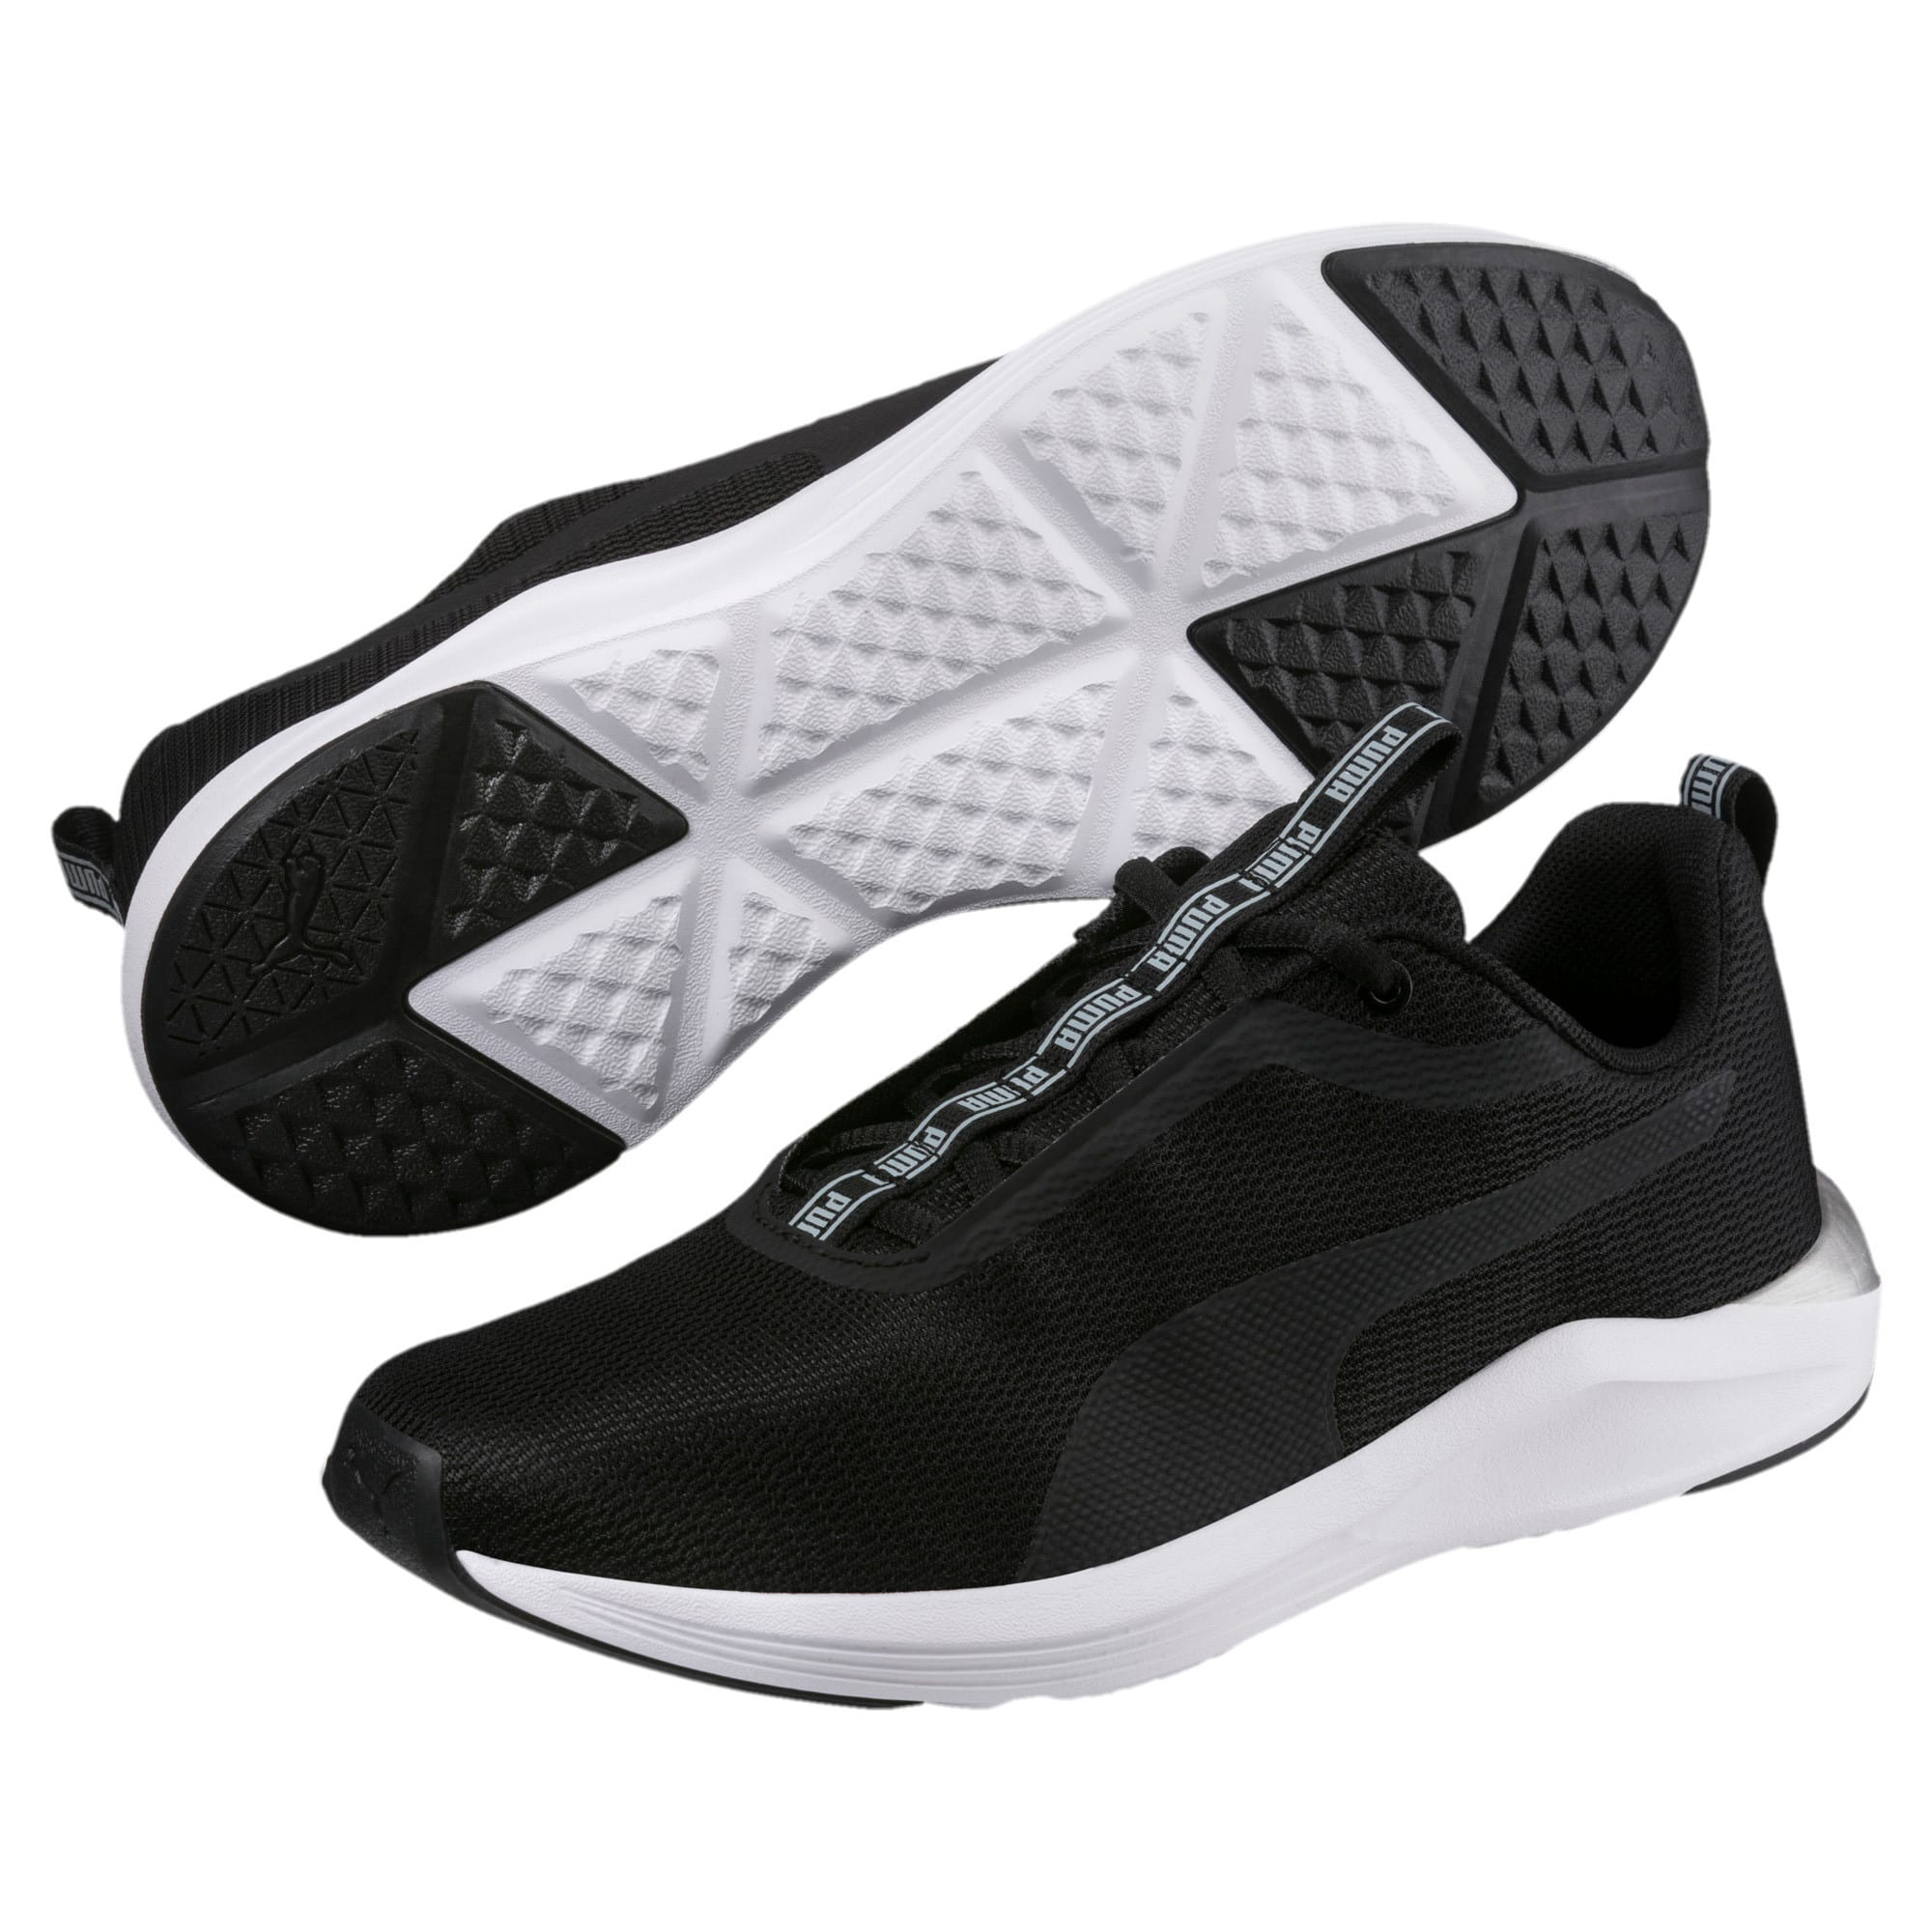 Thumbnail 2 of Prowl 2 Women's Training Shoes, Puma Black-Puma White, medium